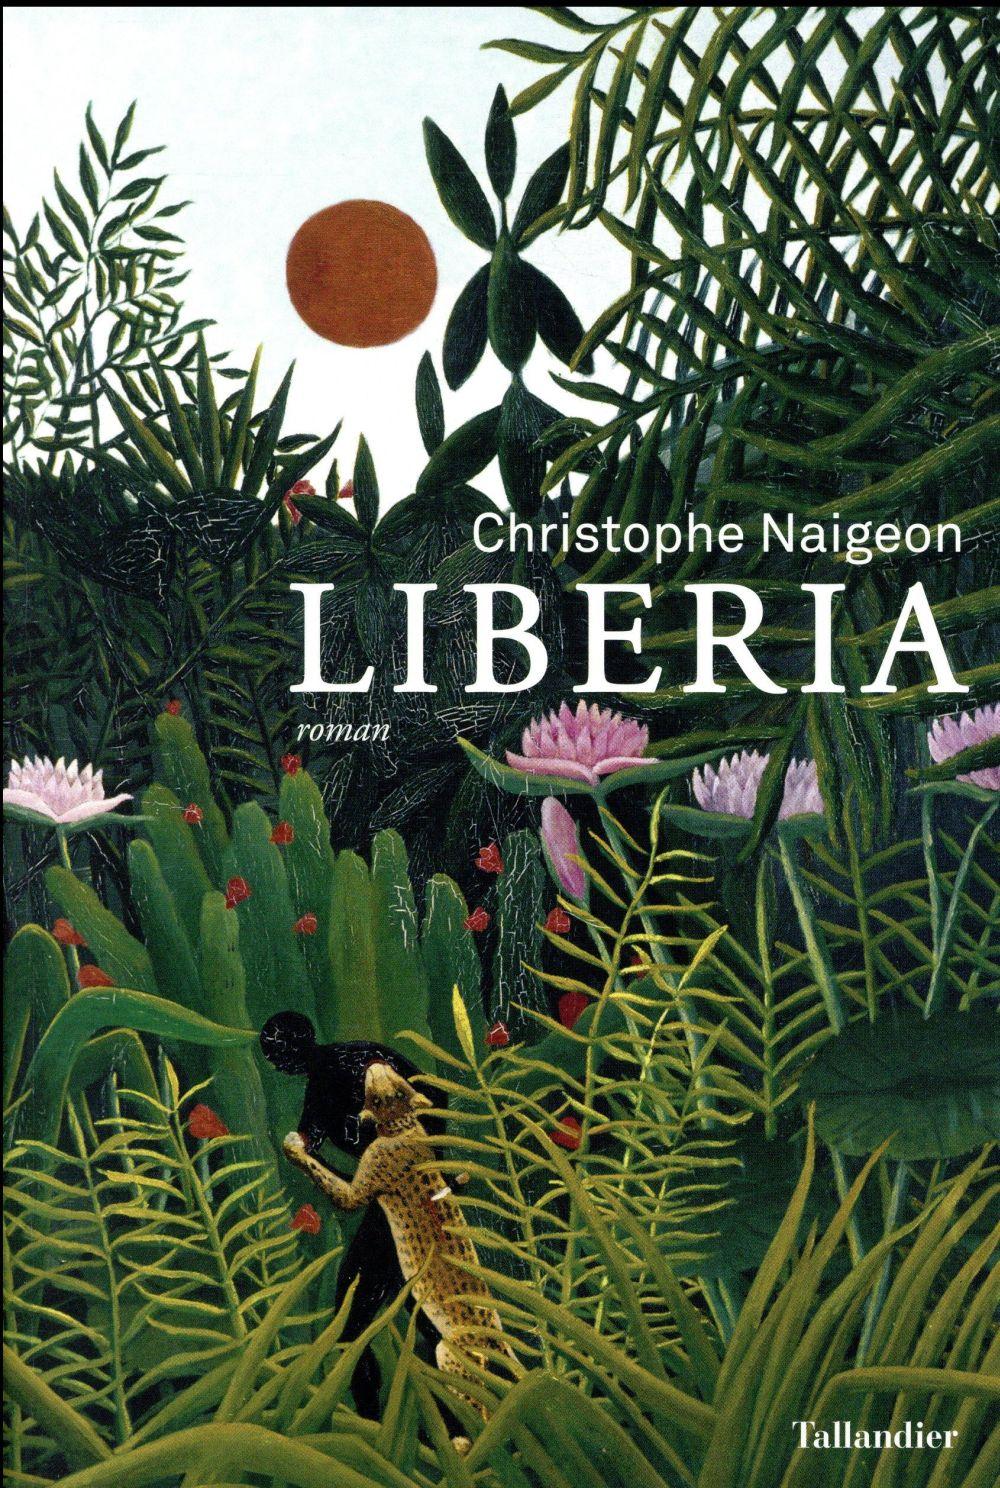 Naigeon Christophe - LIBERIA